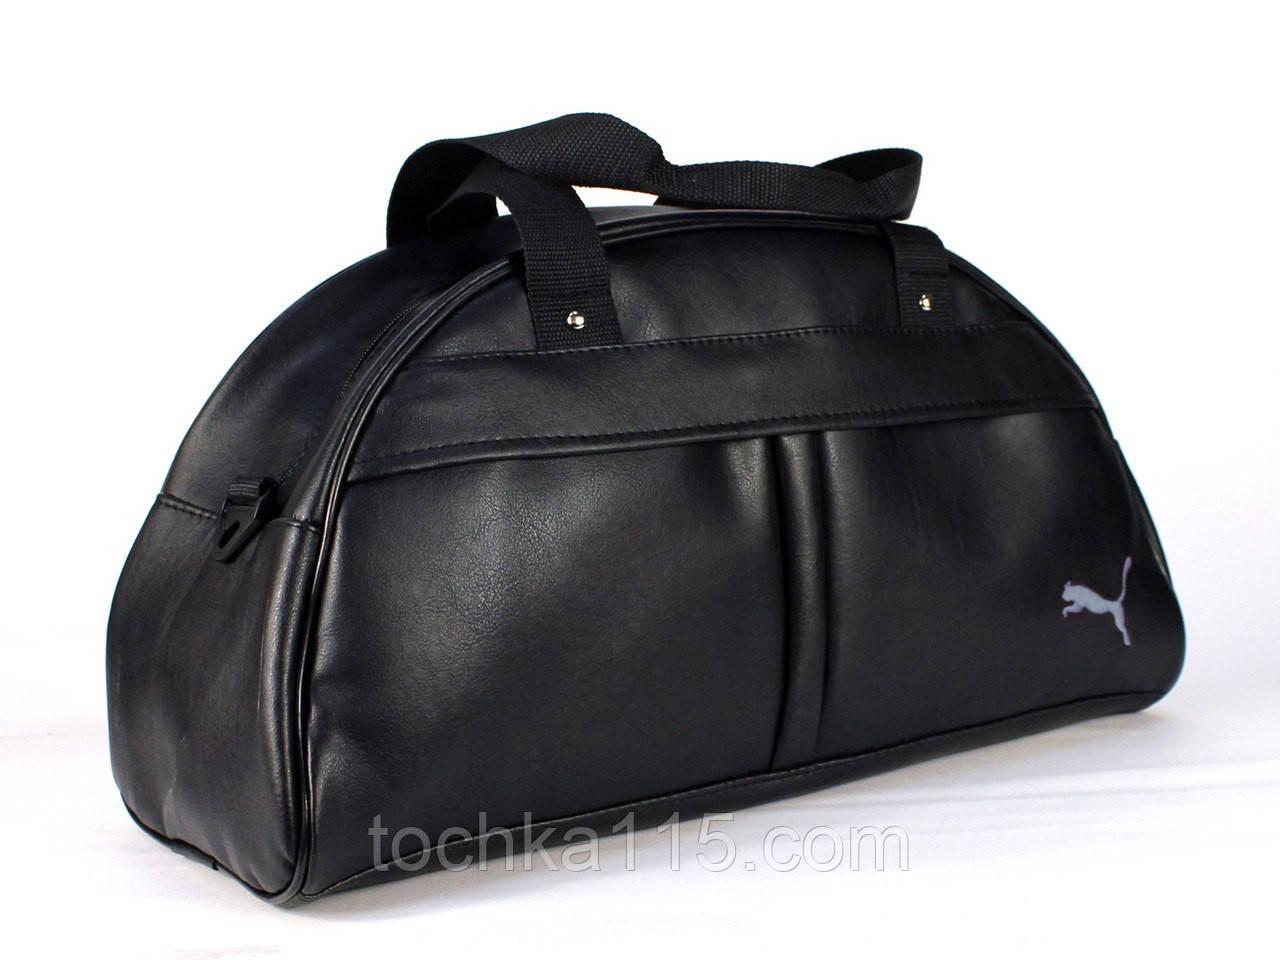 7b8d6453eec5 Спортивная сумка Puma логотип белый реплика от интернет-магазина ...